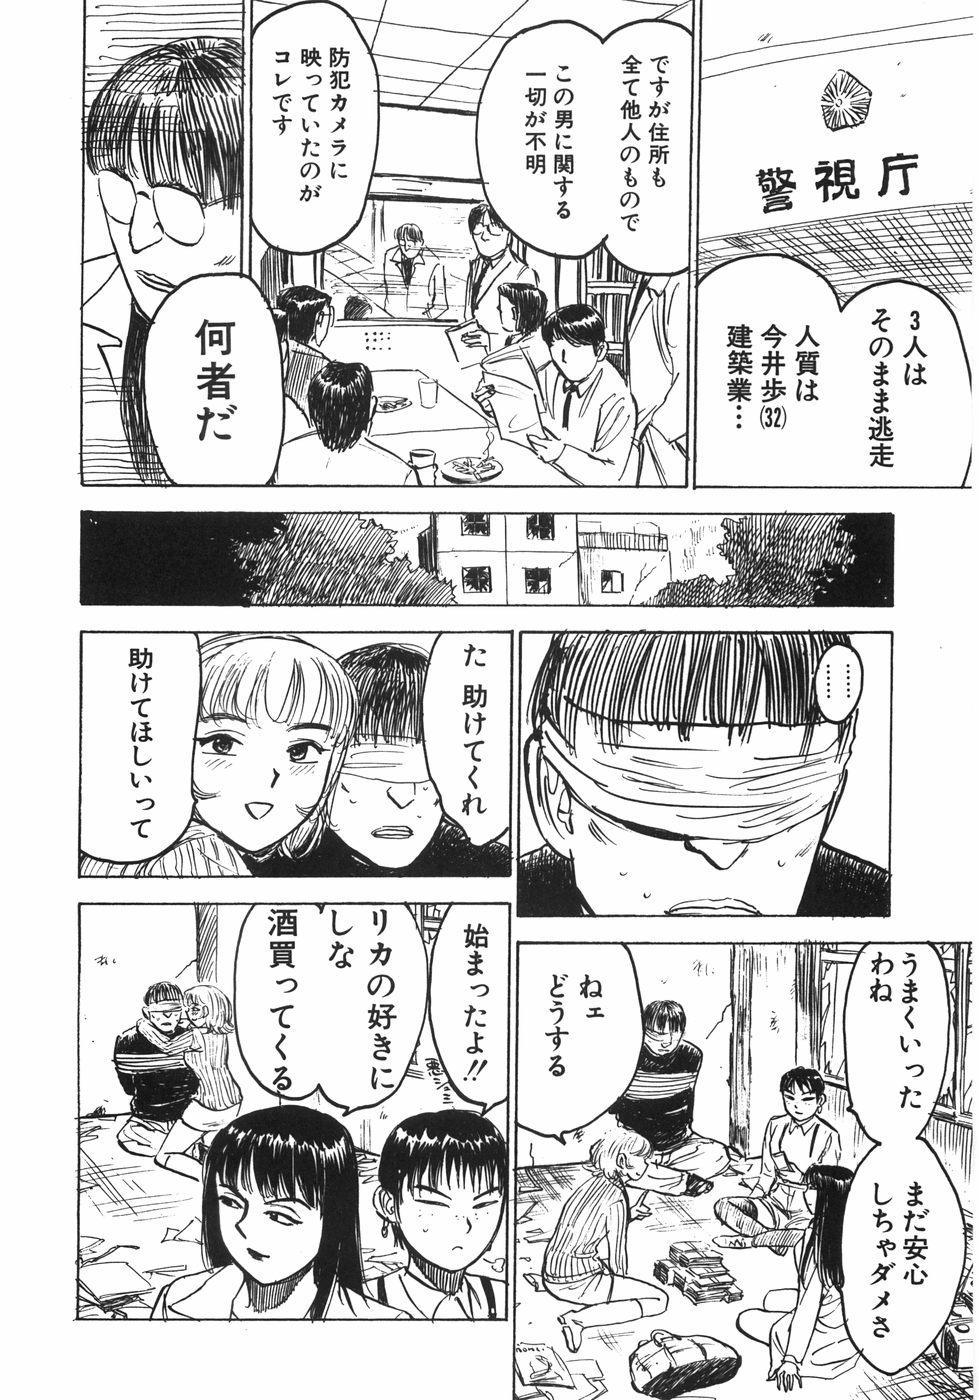 Ningyou no Yakata - The Doll House 108